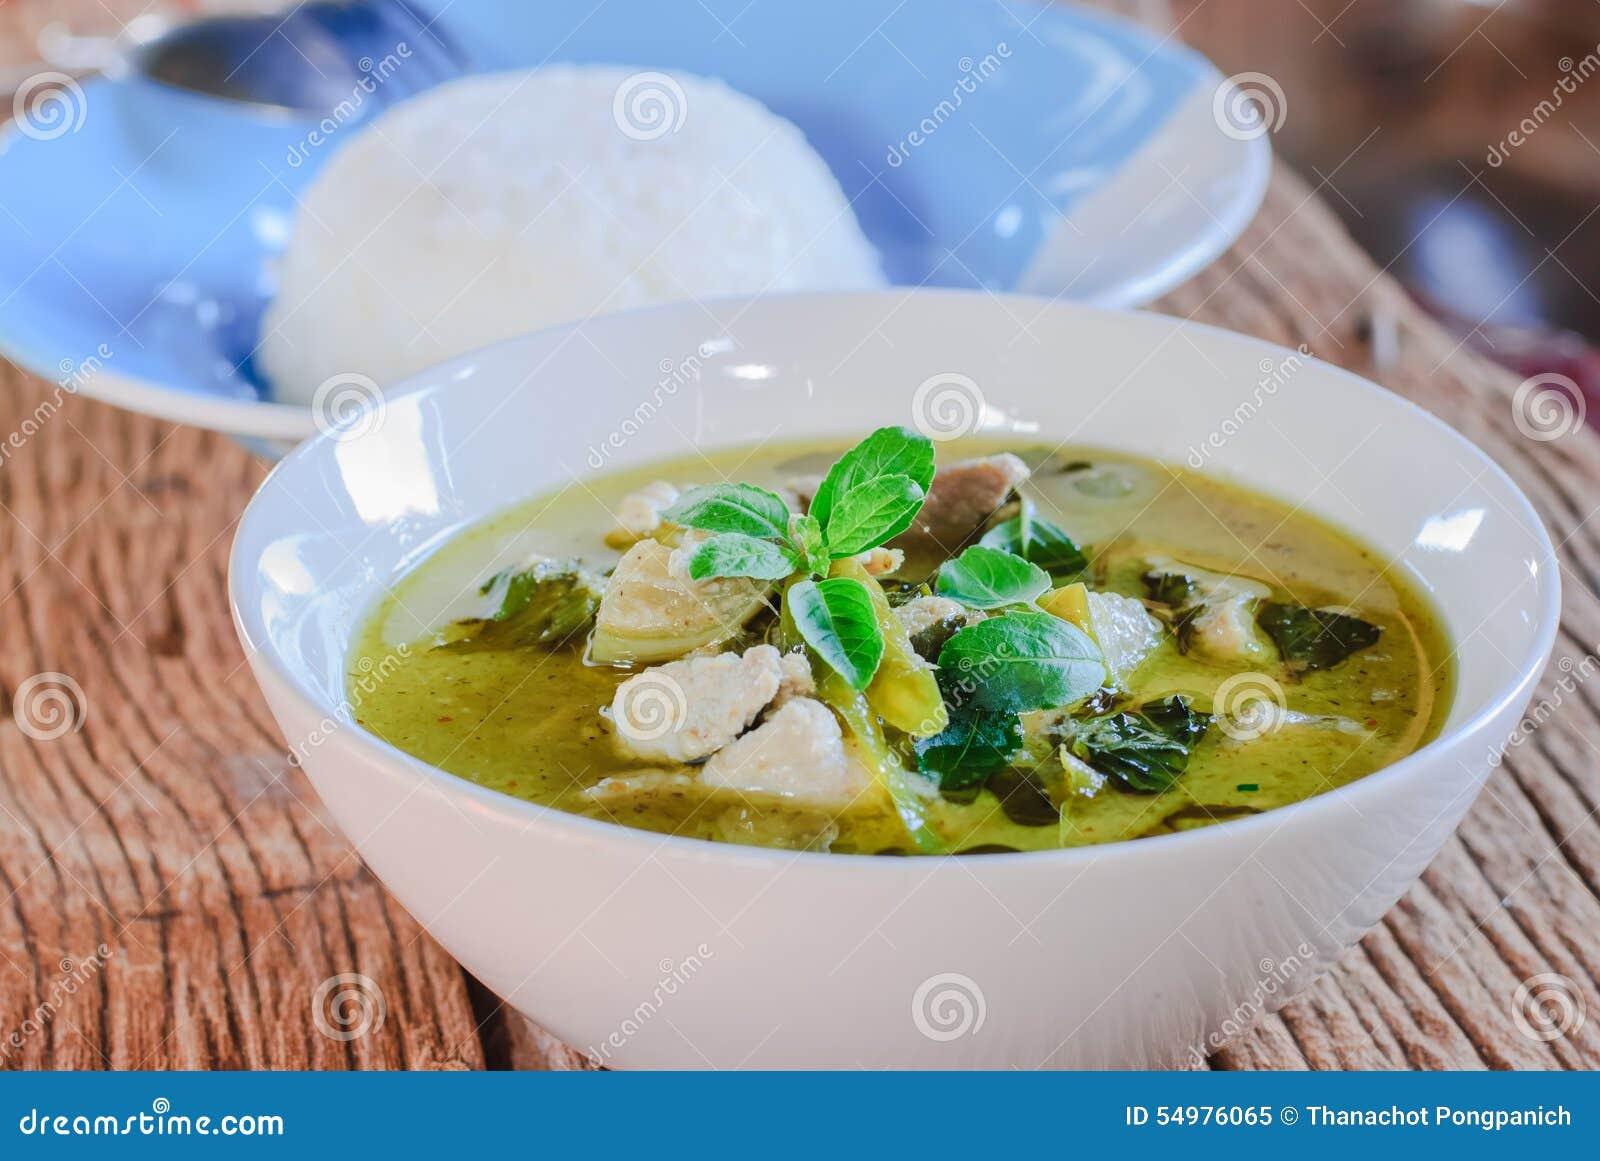 Grön curry med griskött